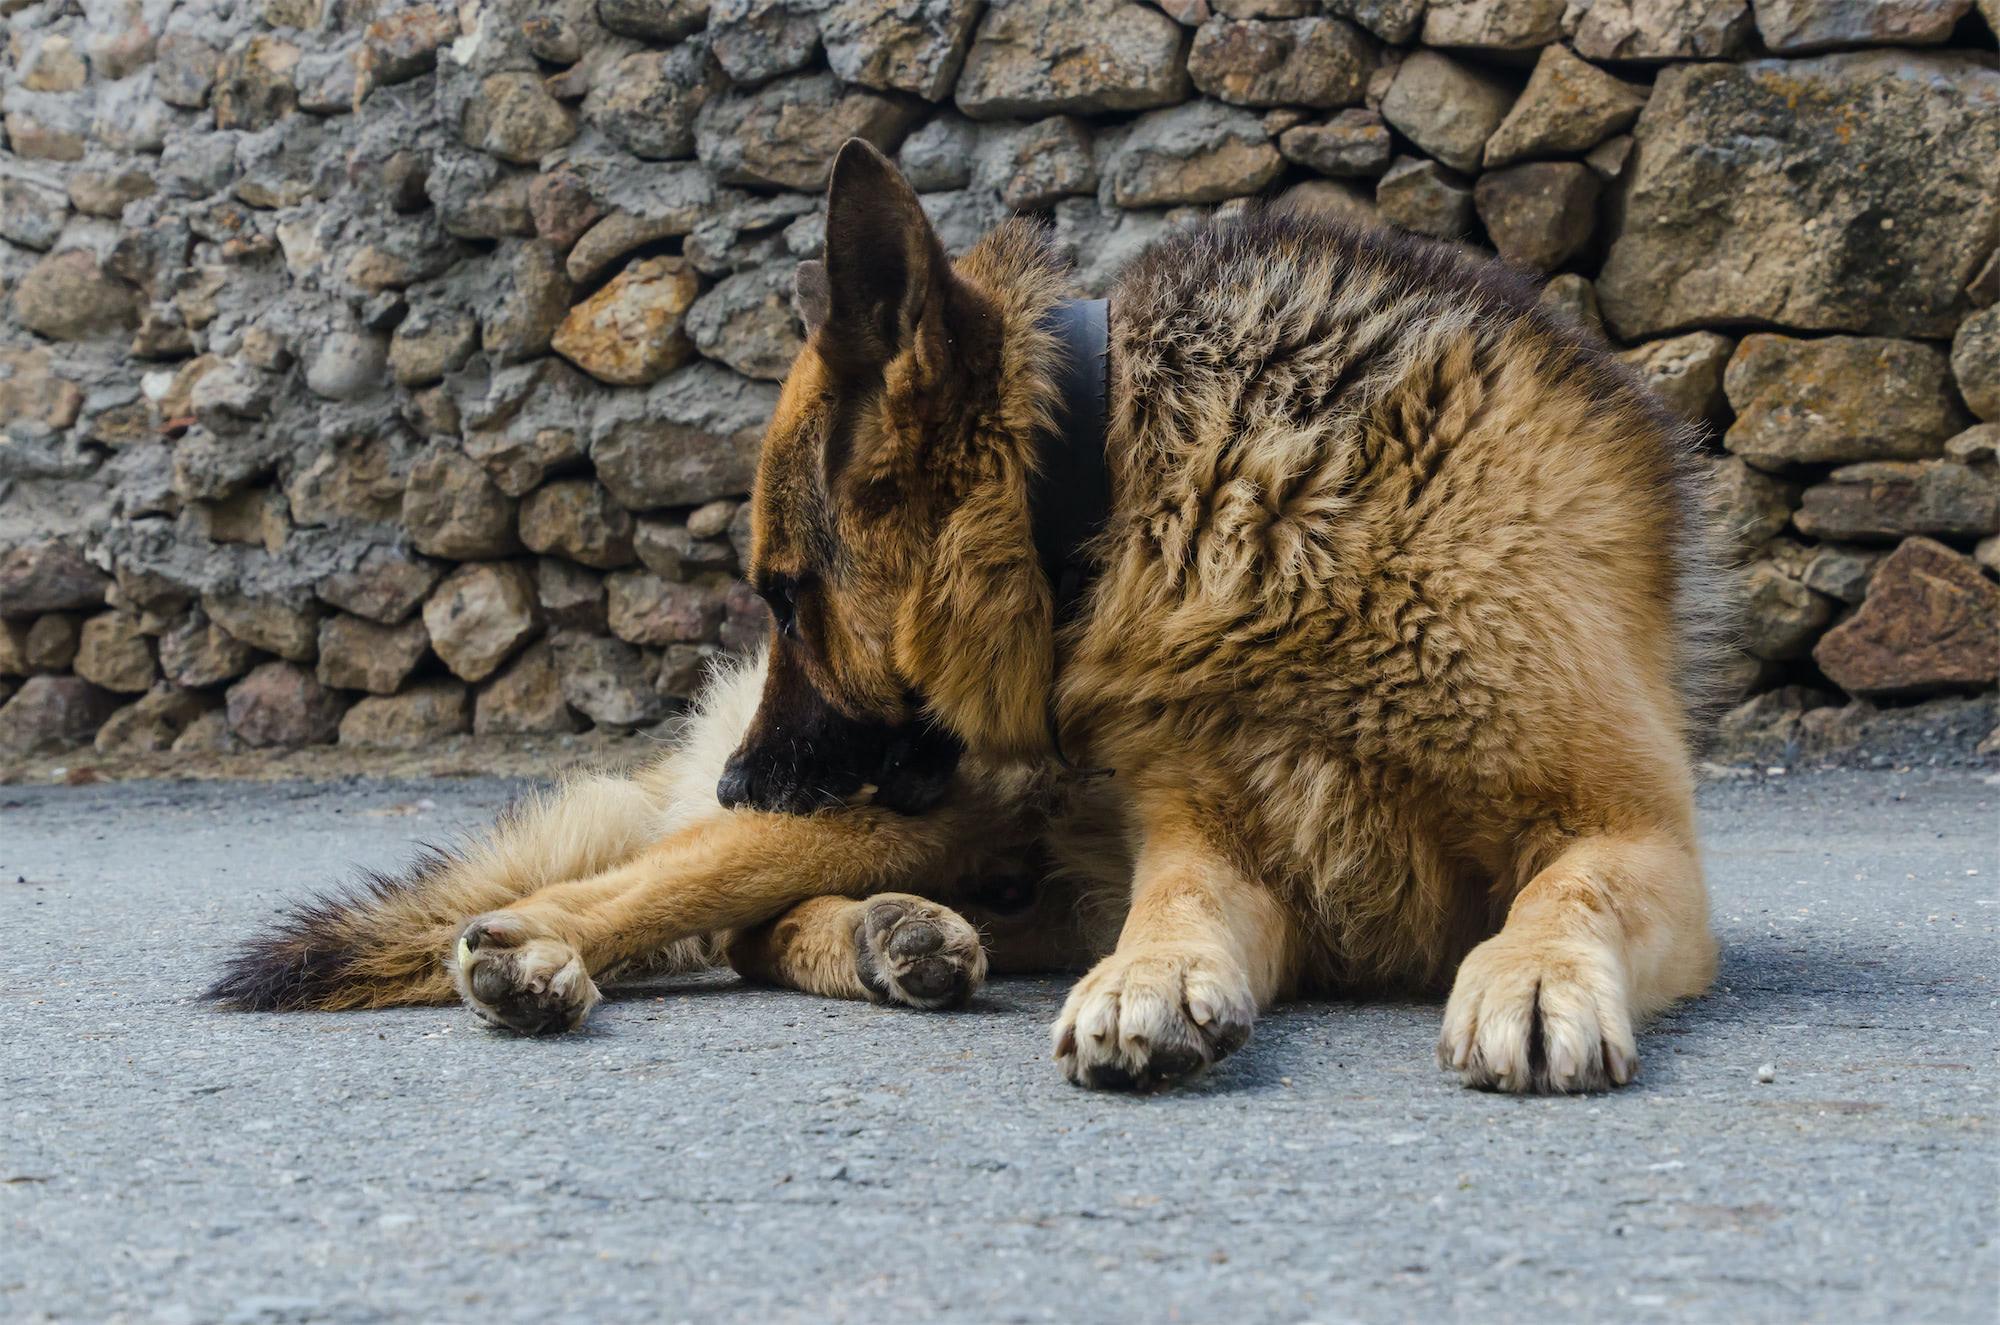 German shepherd biting for ticks and fleas